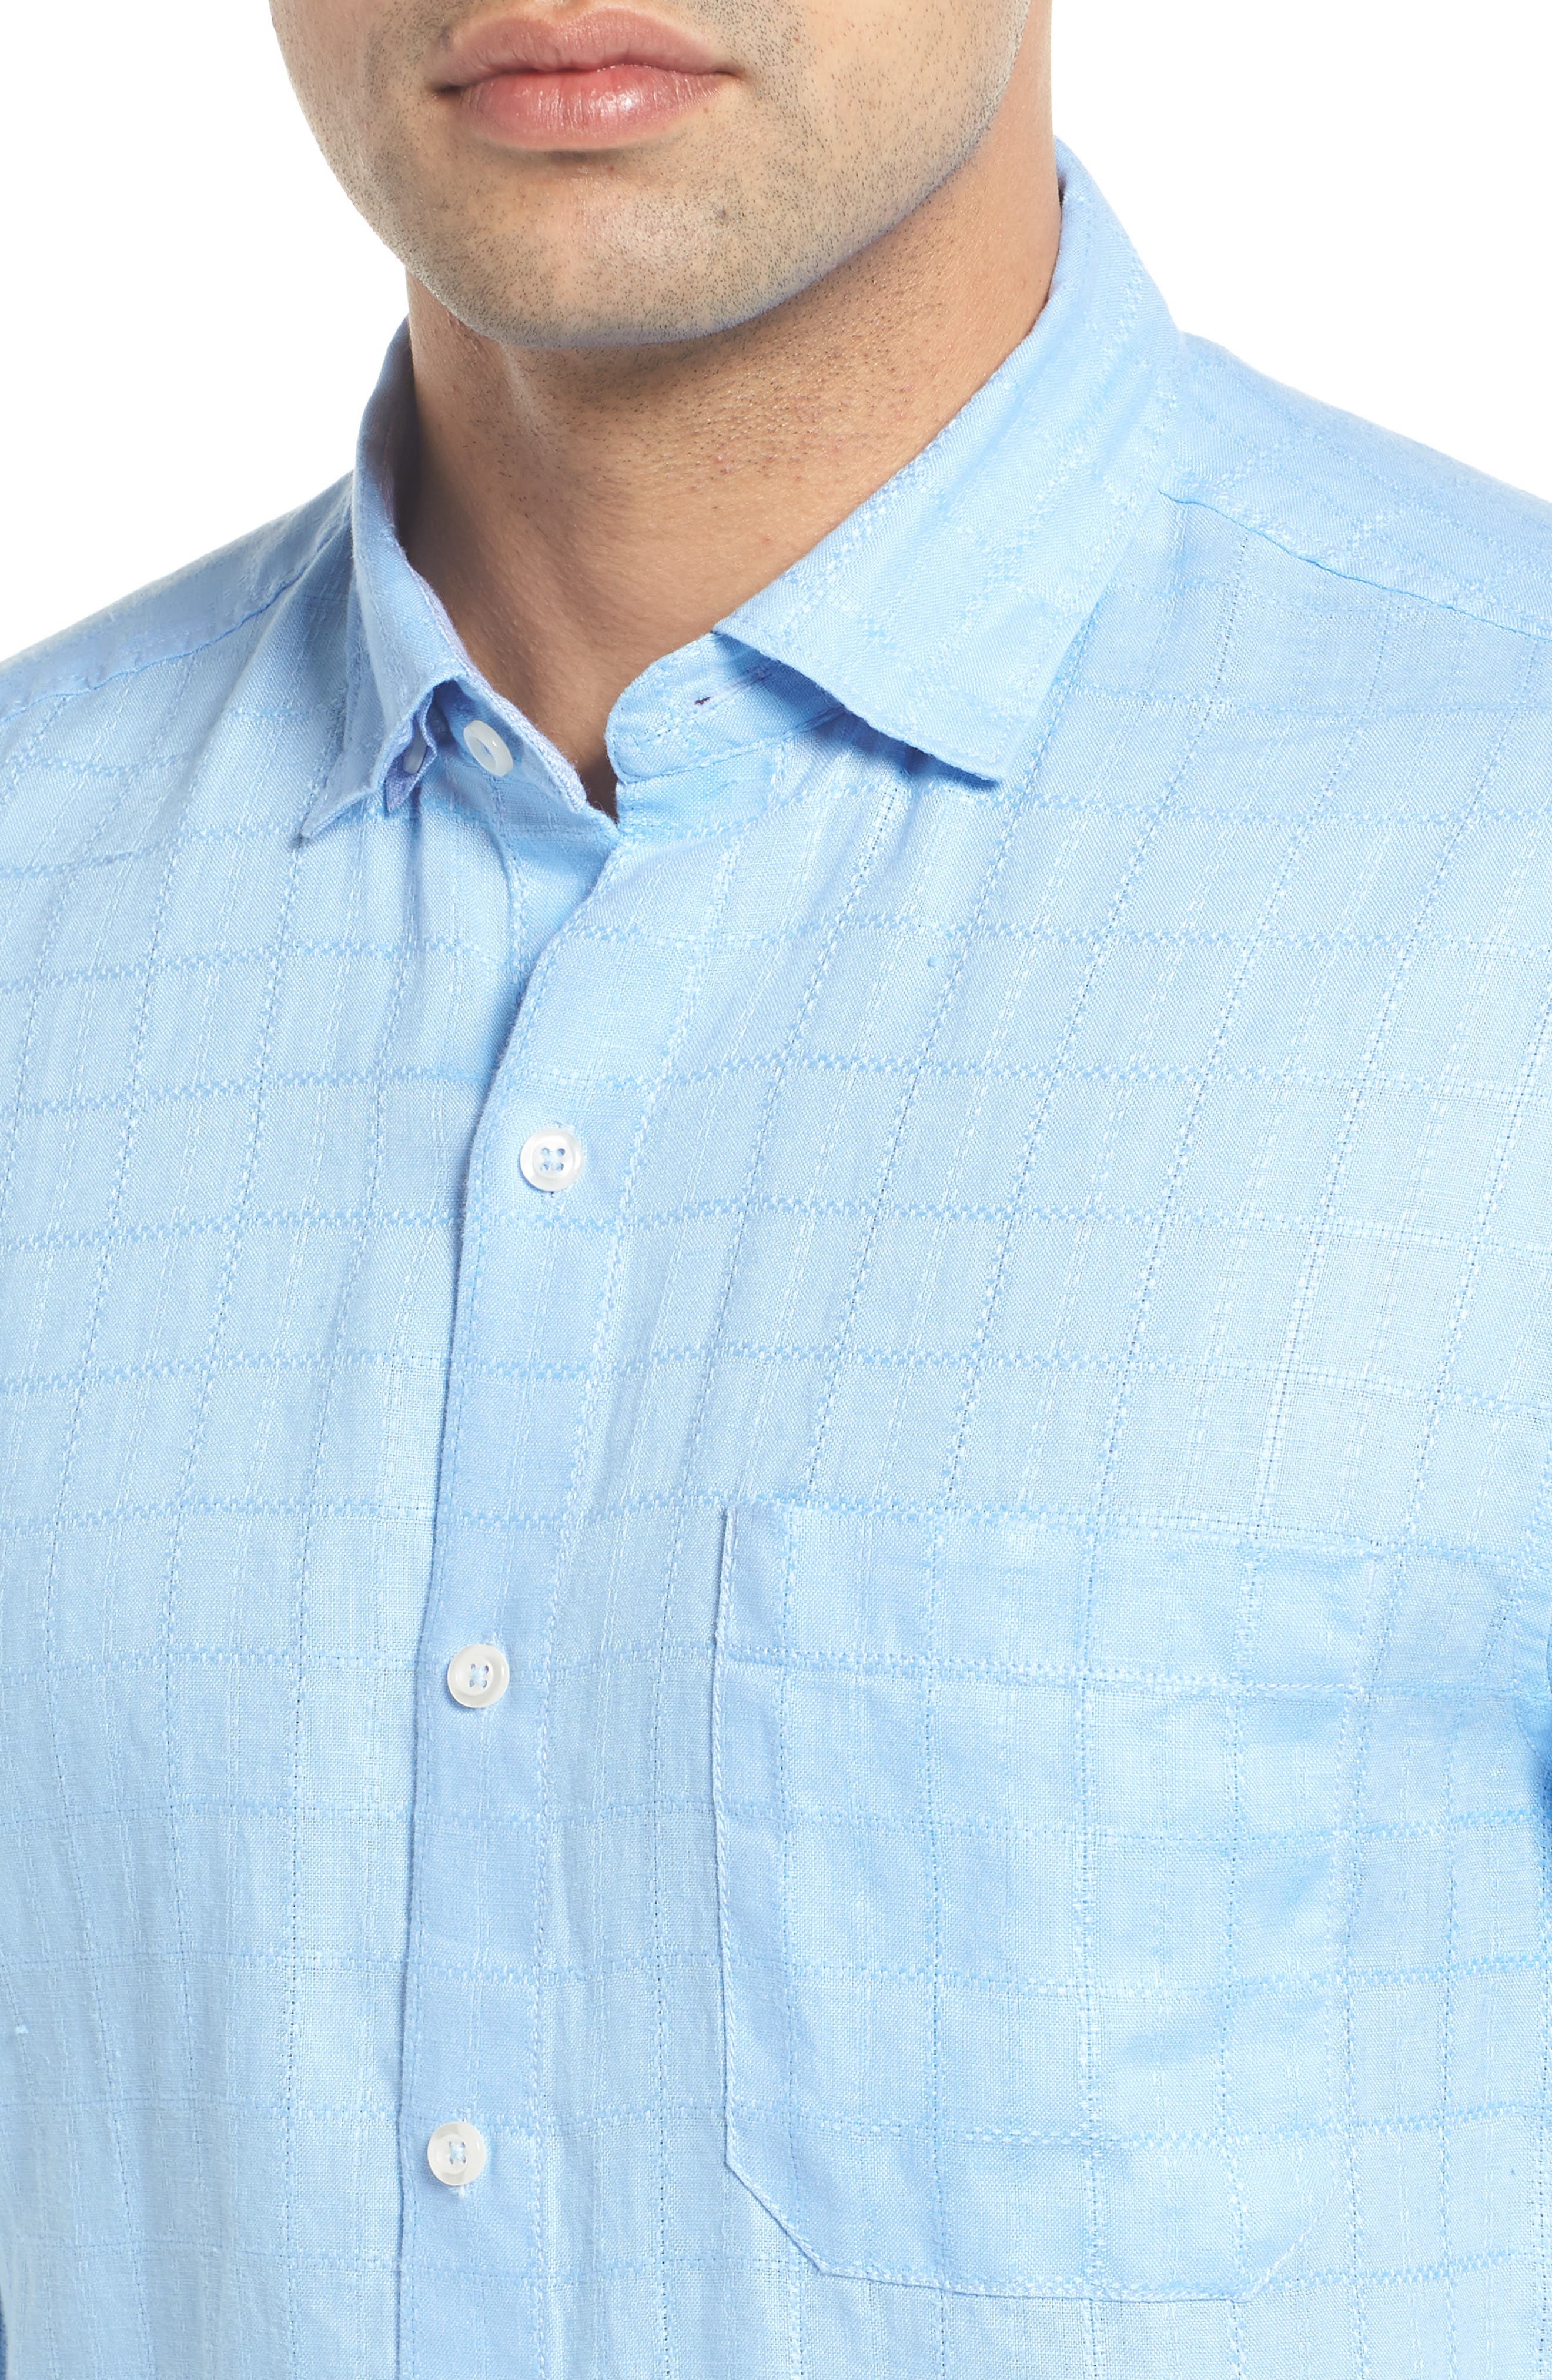 Costa Sera Linen Sport Shirt,                             Alternate thumbnail 2, color,                             Light Sky